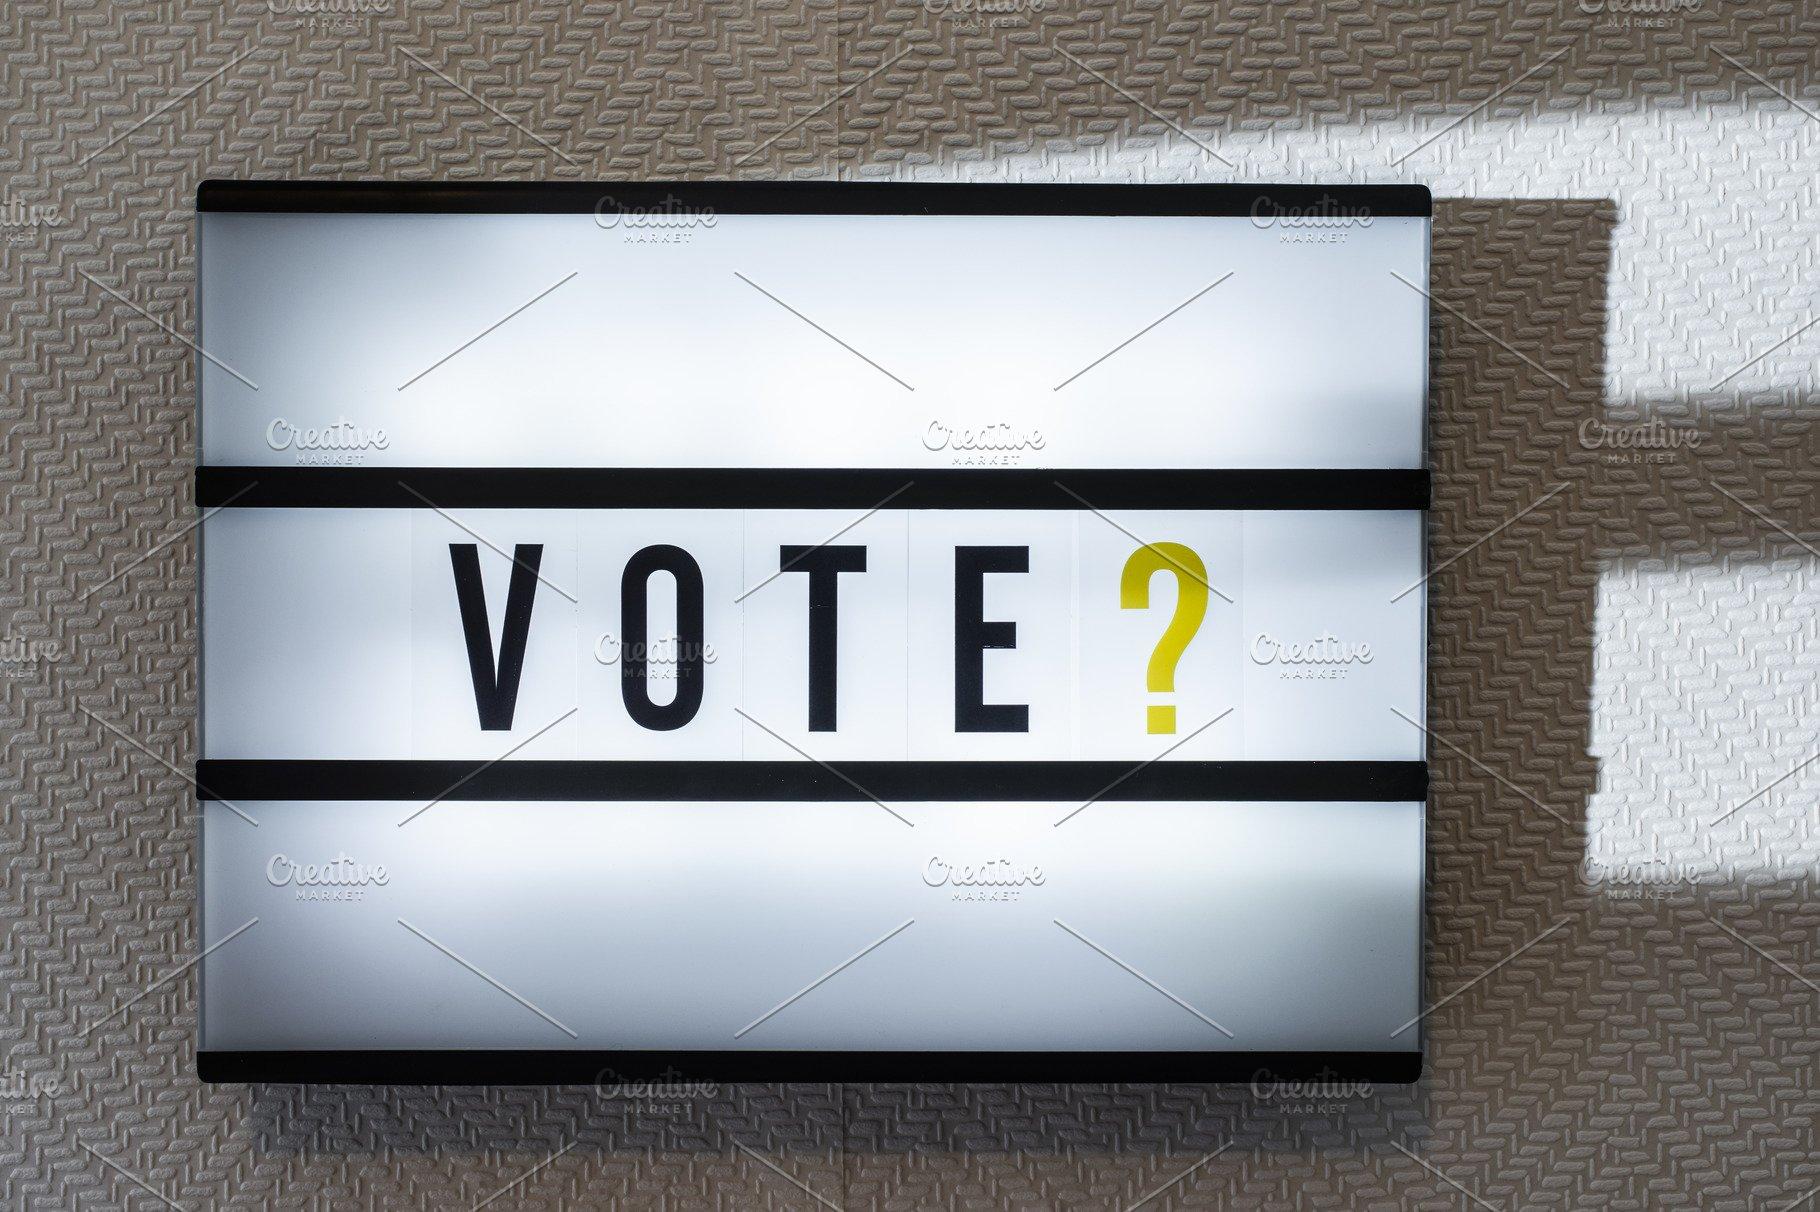 Message Vote on illuminated board  V